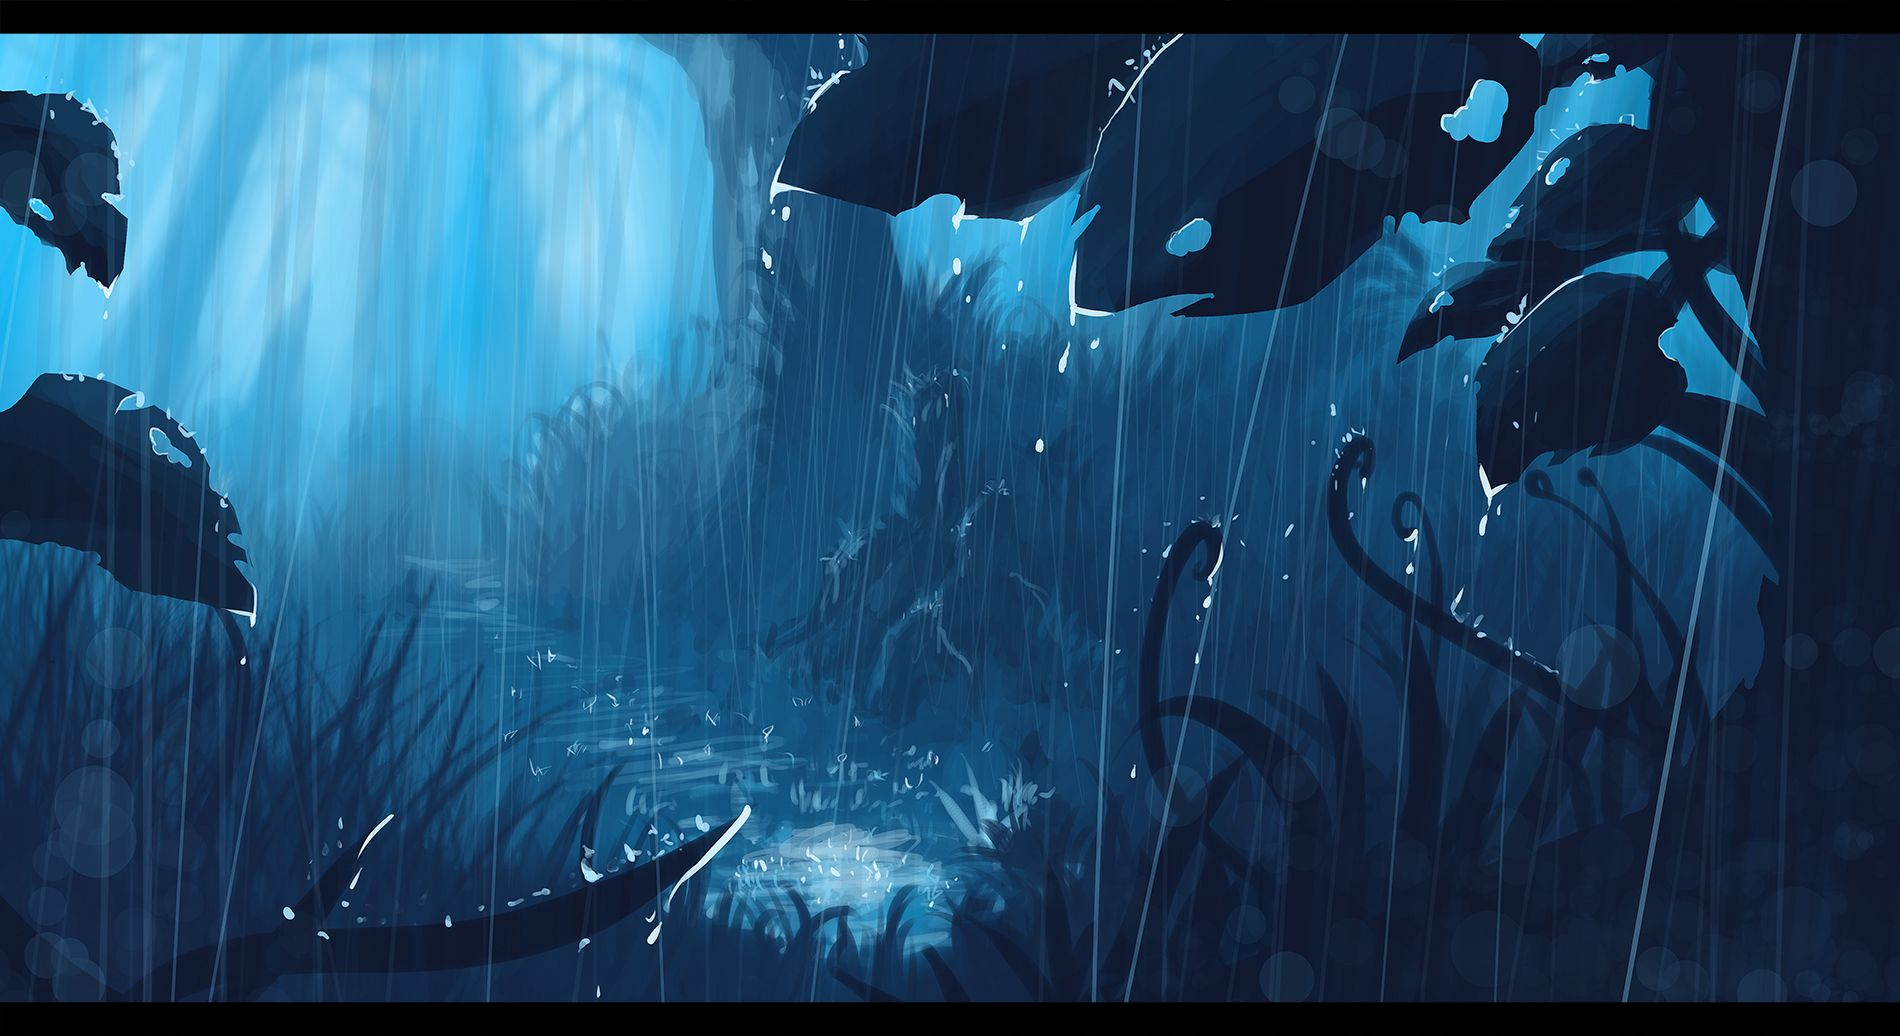 Anime Rain Wallpaper Hd Posted By Ryan Mercado